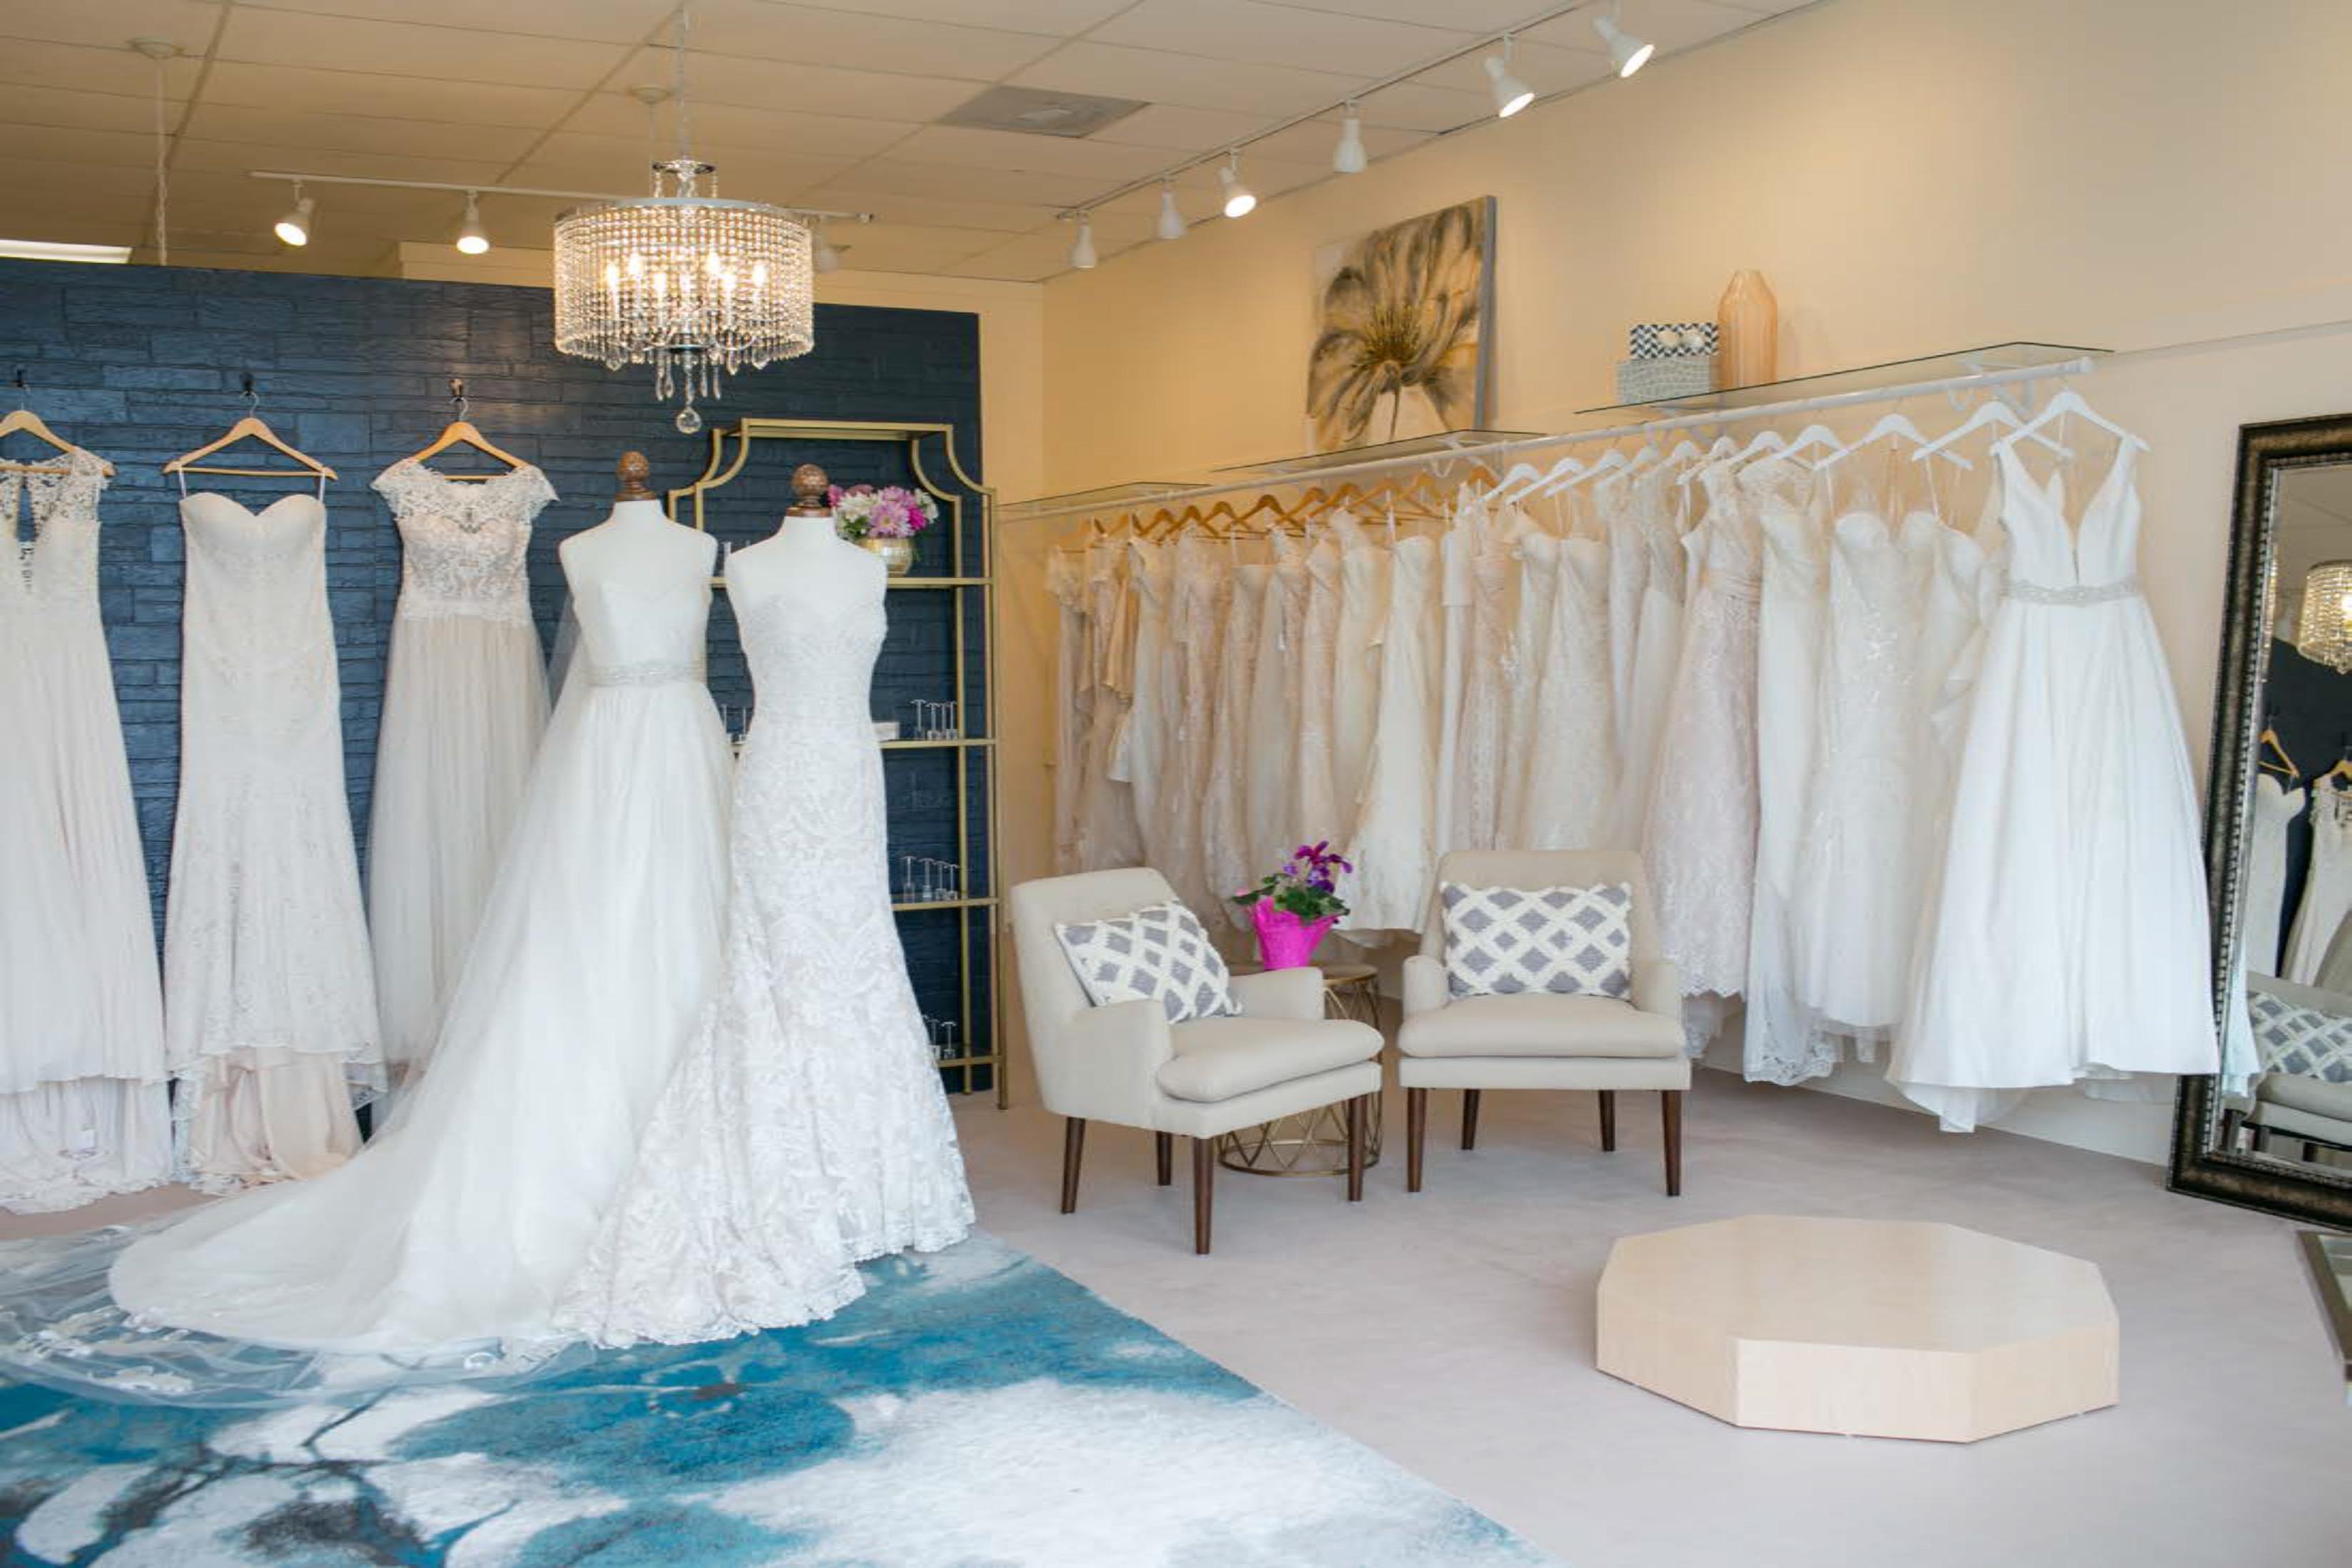 Pawleys Island Bridal Boutique